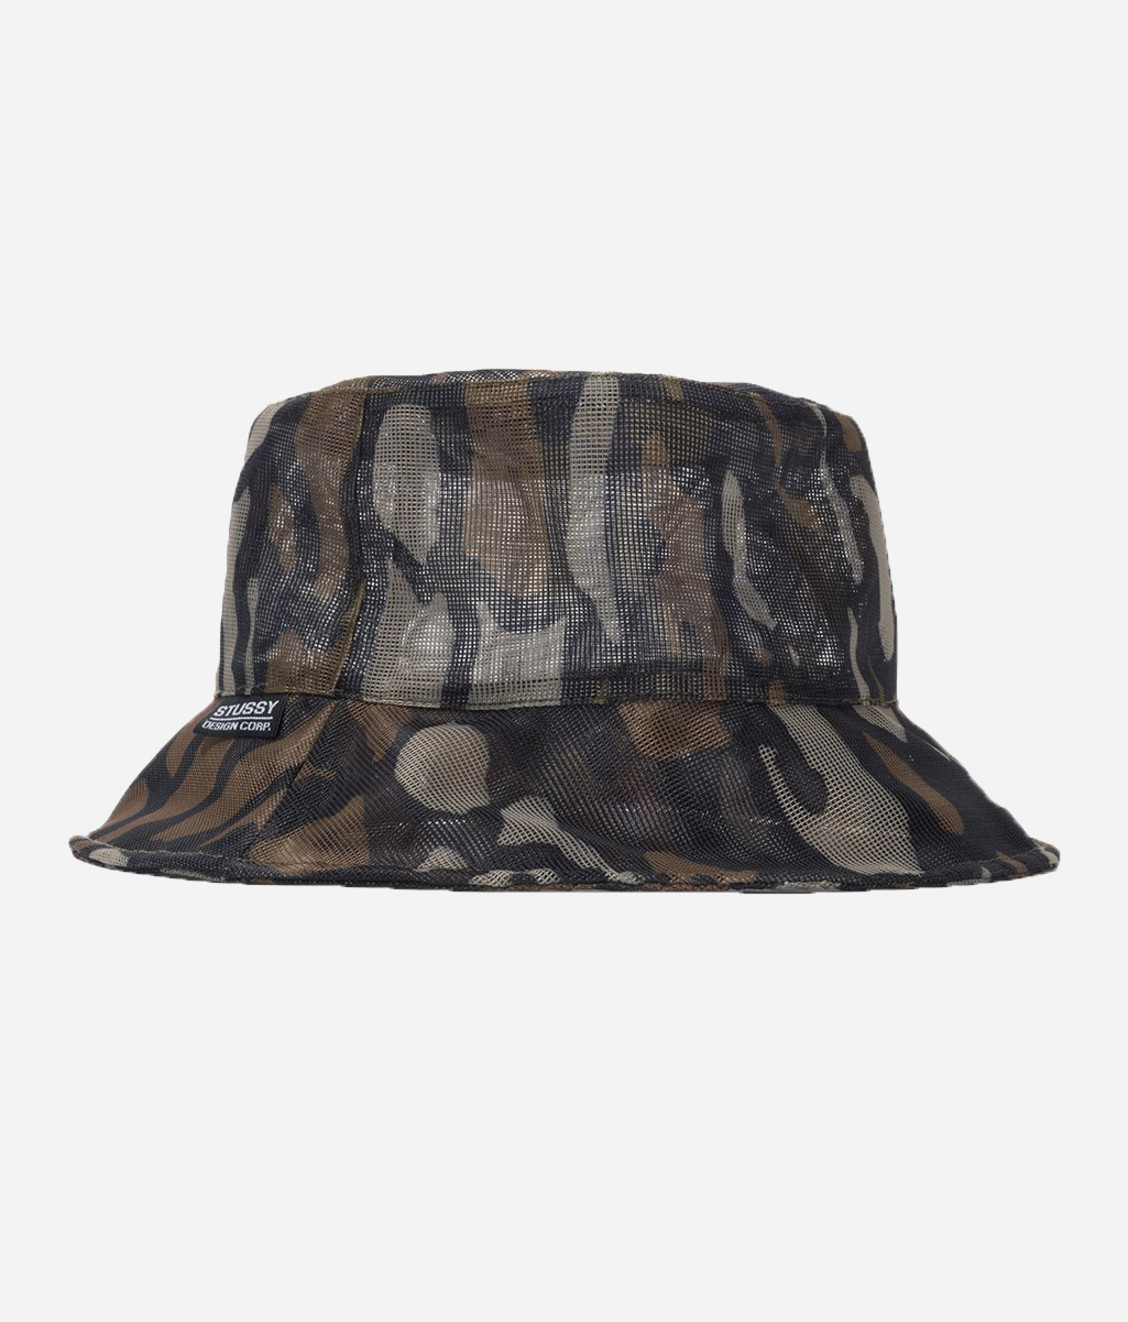 Stussy Stussy Tree Bark Mesh Bucket Hat Brown